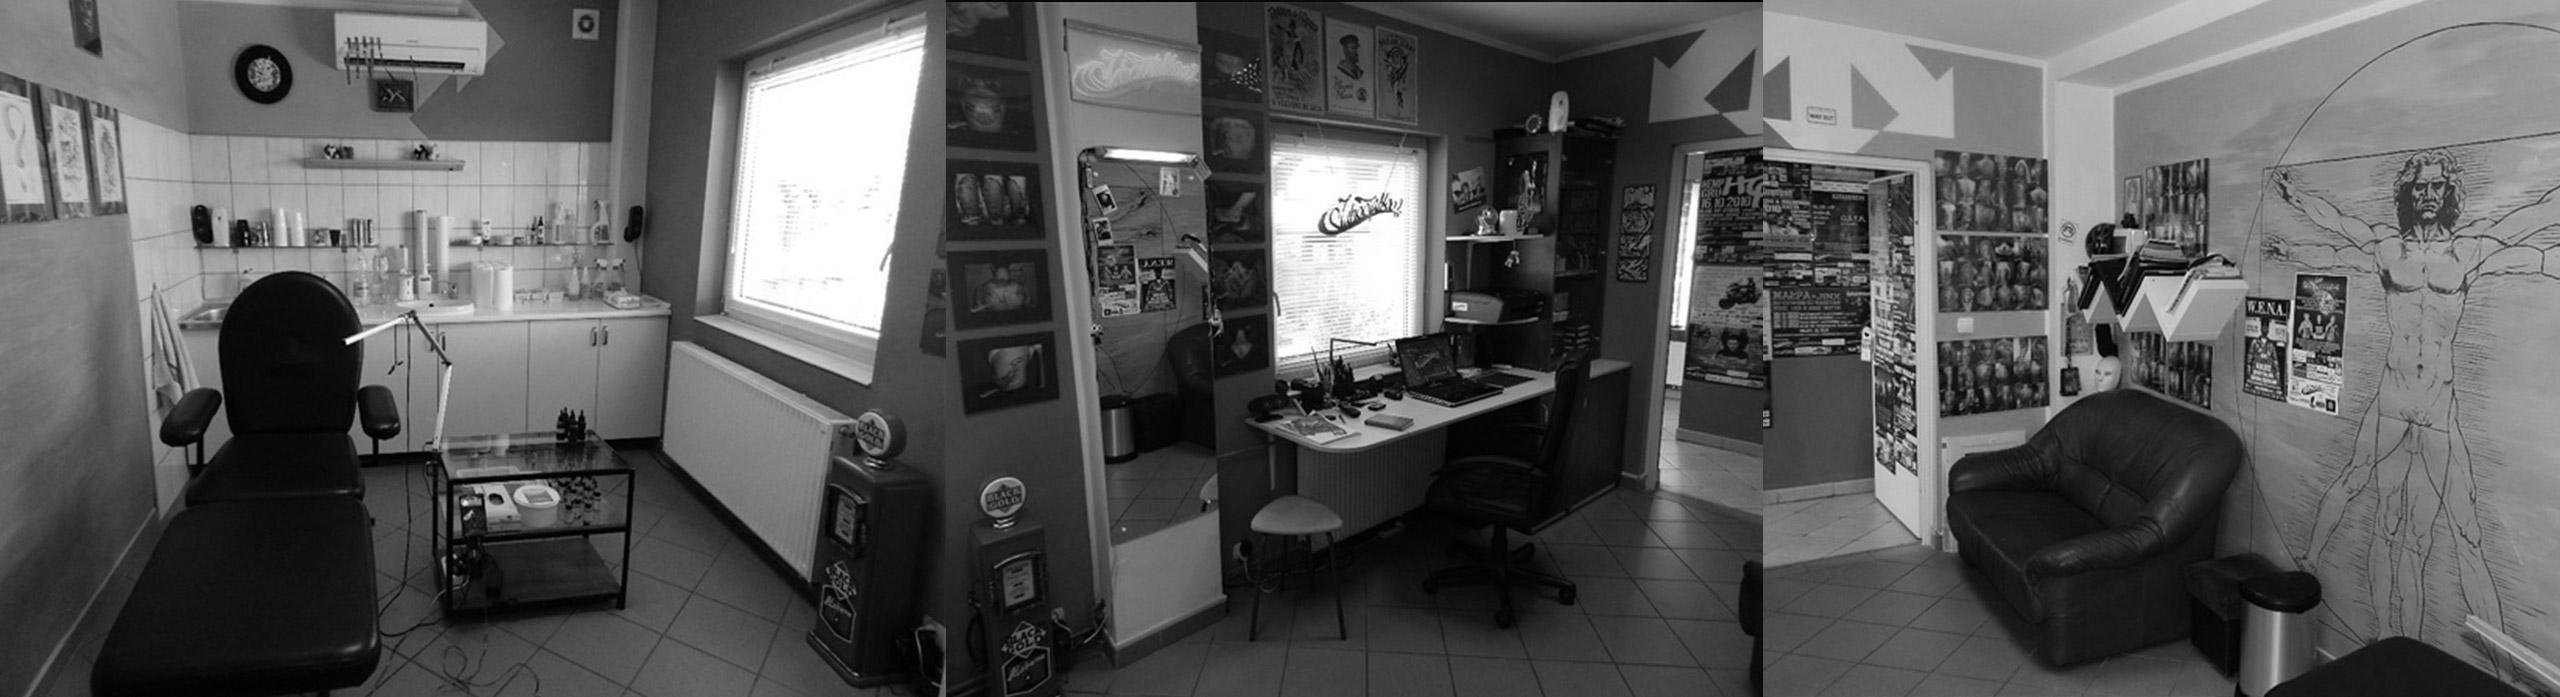 Jahootattoo Artistic Tattoo Studio